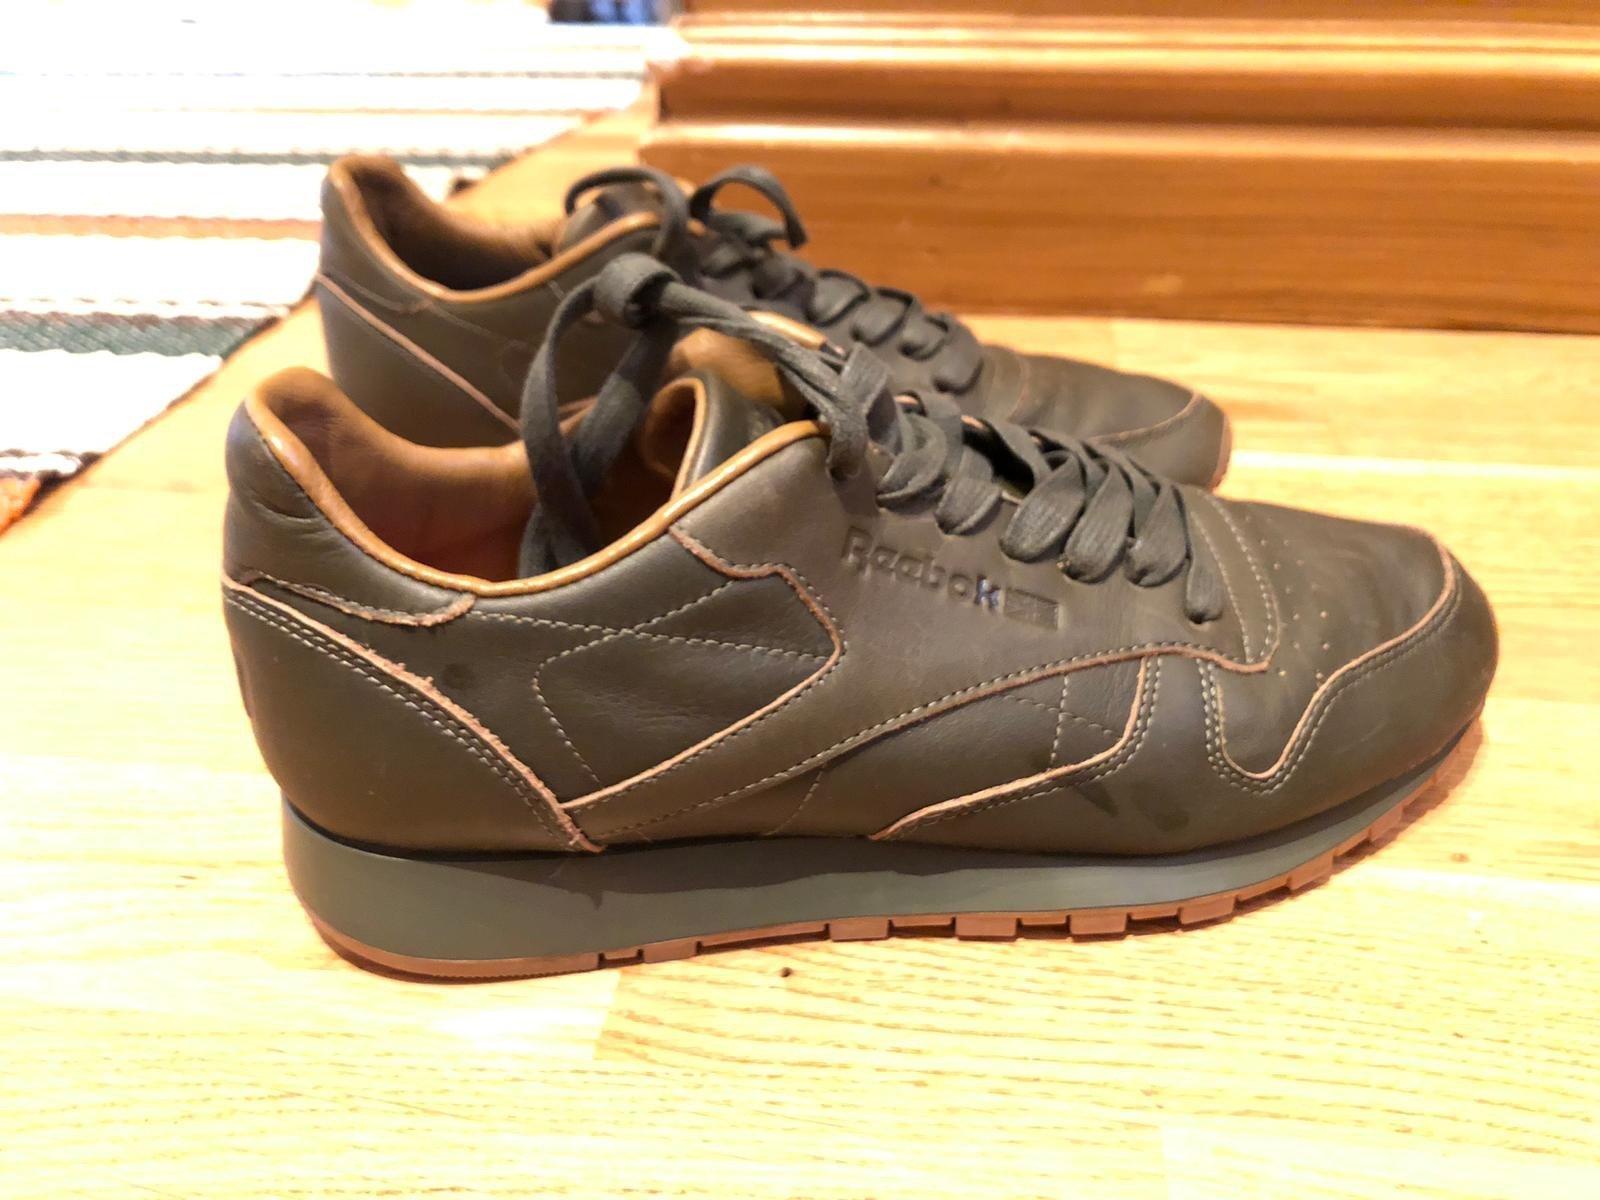 915c9fe823b Kendrick Lamar X Reebok, storlek 39. Sneakers l.. (353342612) ᐈ Köp ...